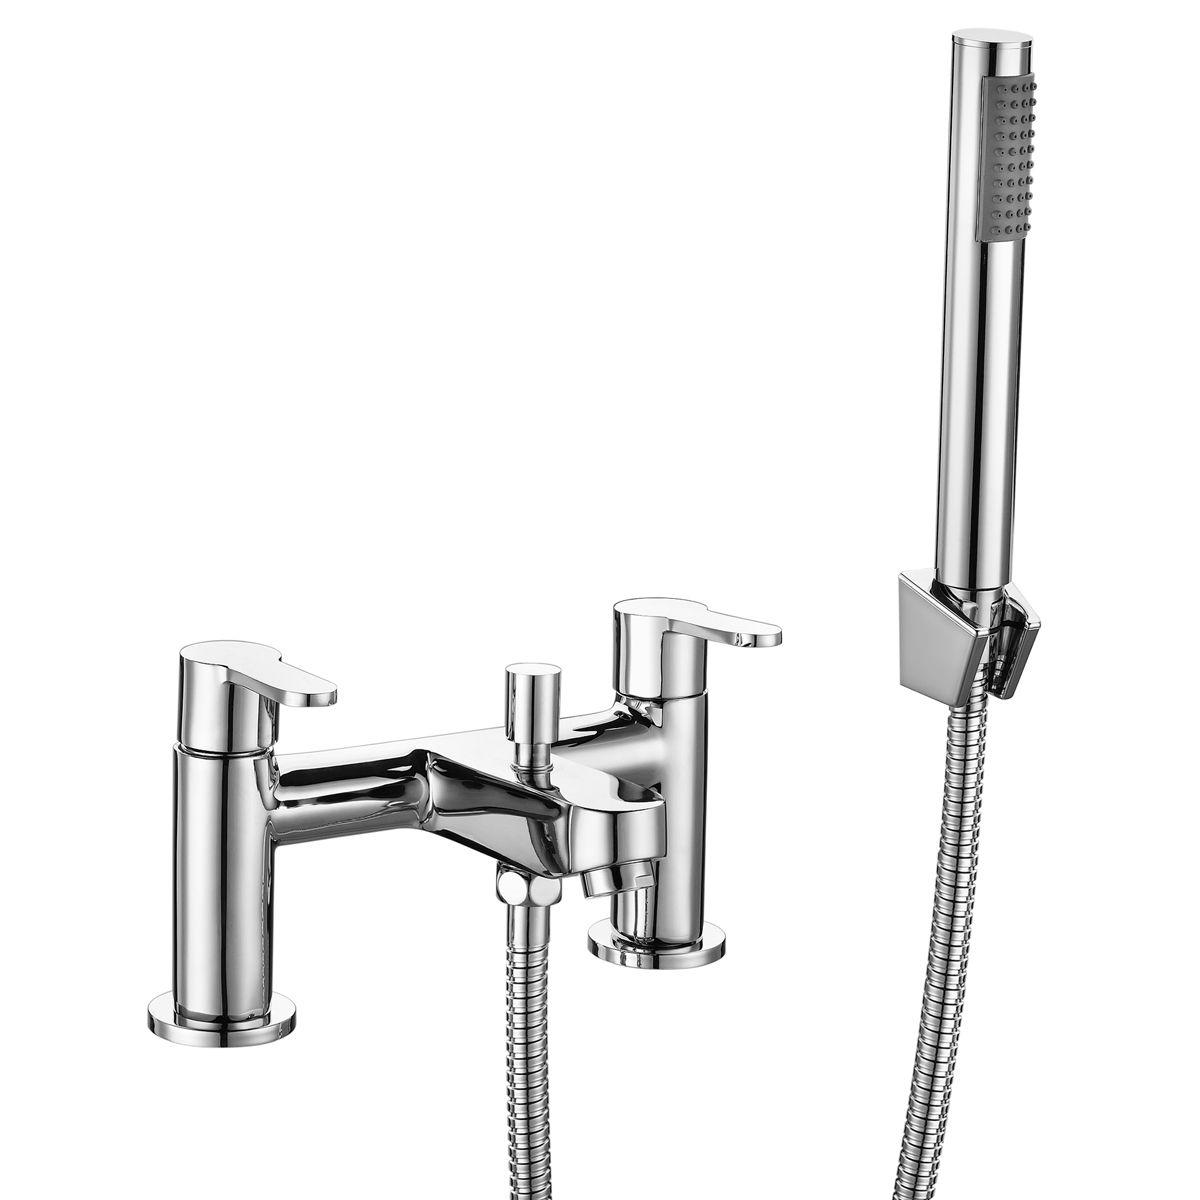 RAK Morning Deck Mounted Shower Bath Mixer Tap